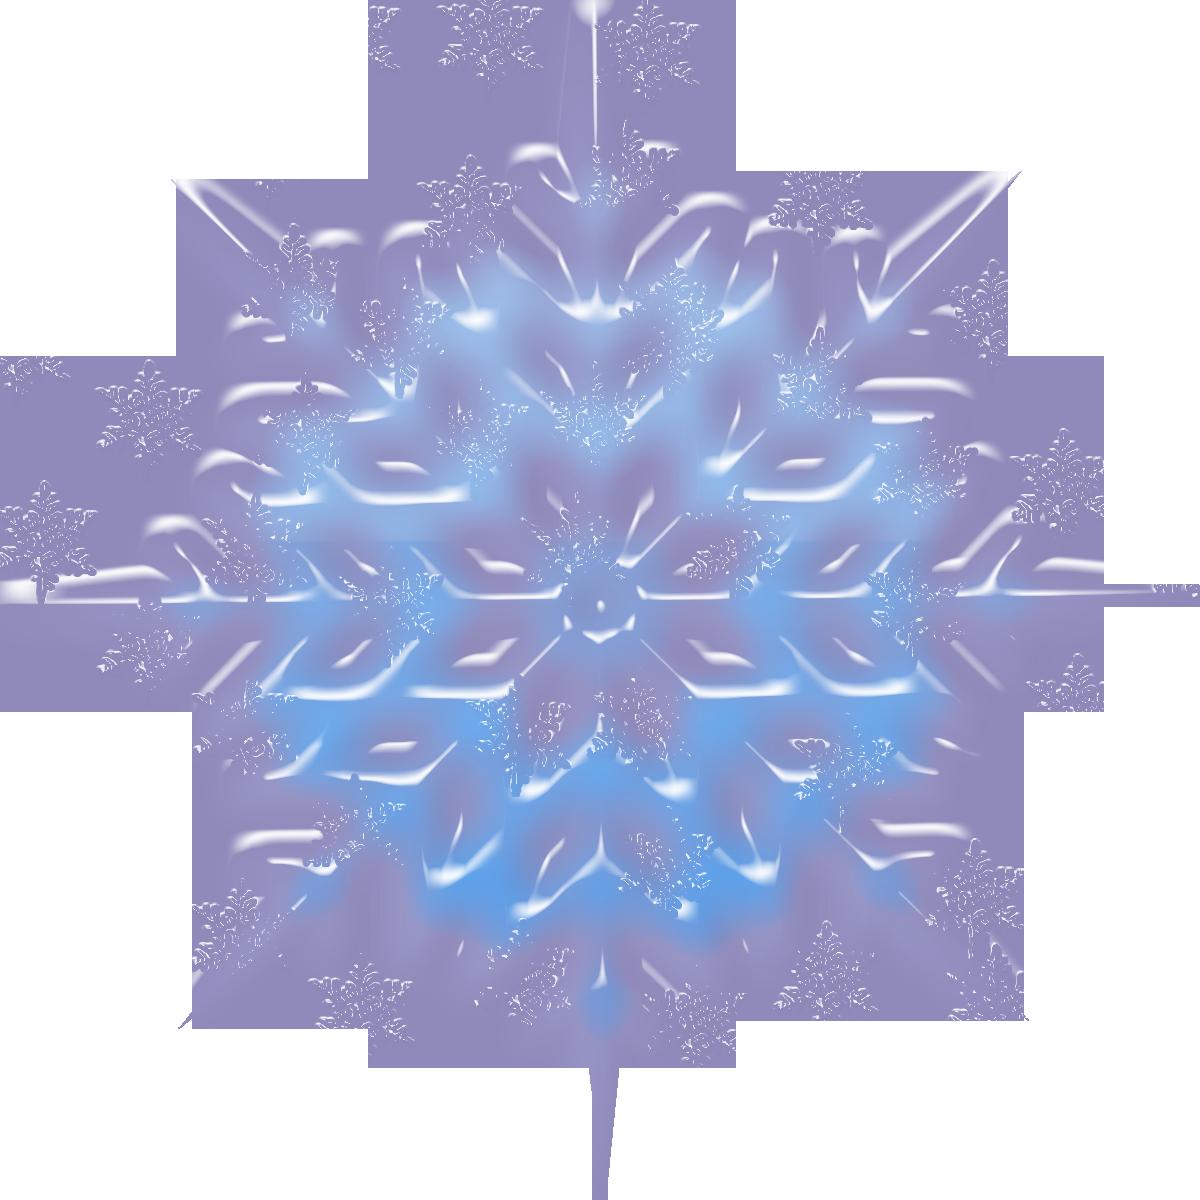 Christmas clipart snowflakes clipart Christmas ClipArt #18 (20).png | Christmas clipart, Snowman and Album clipart